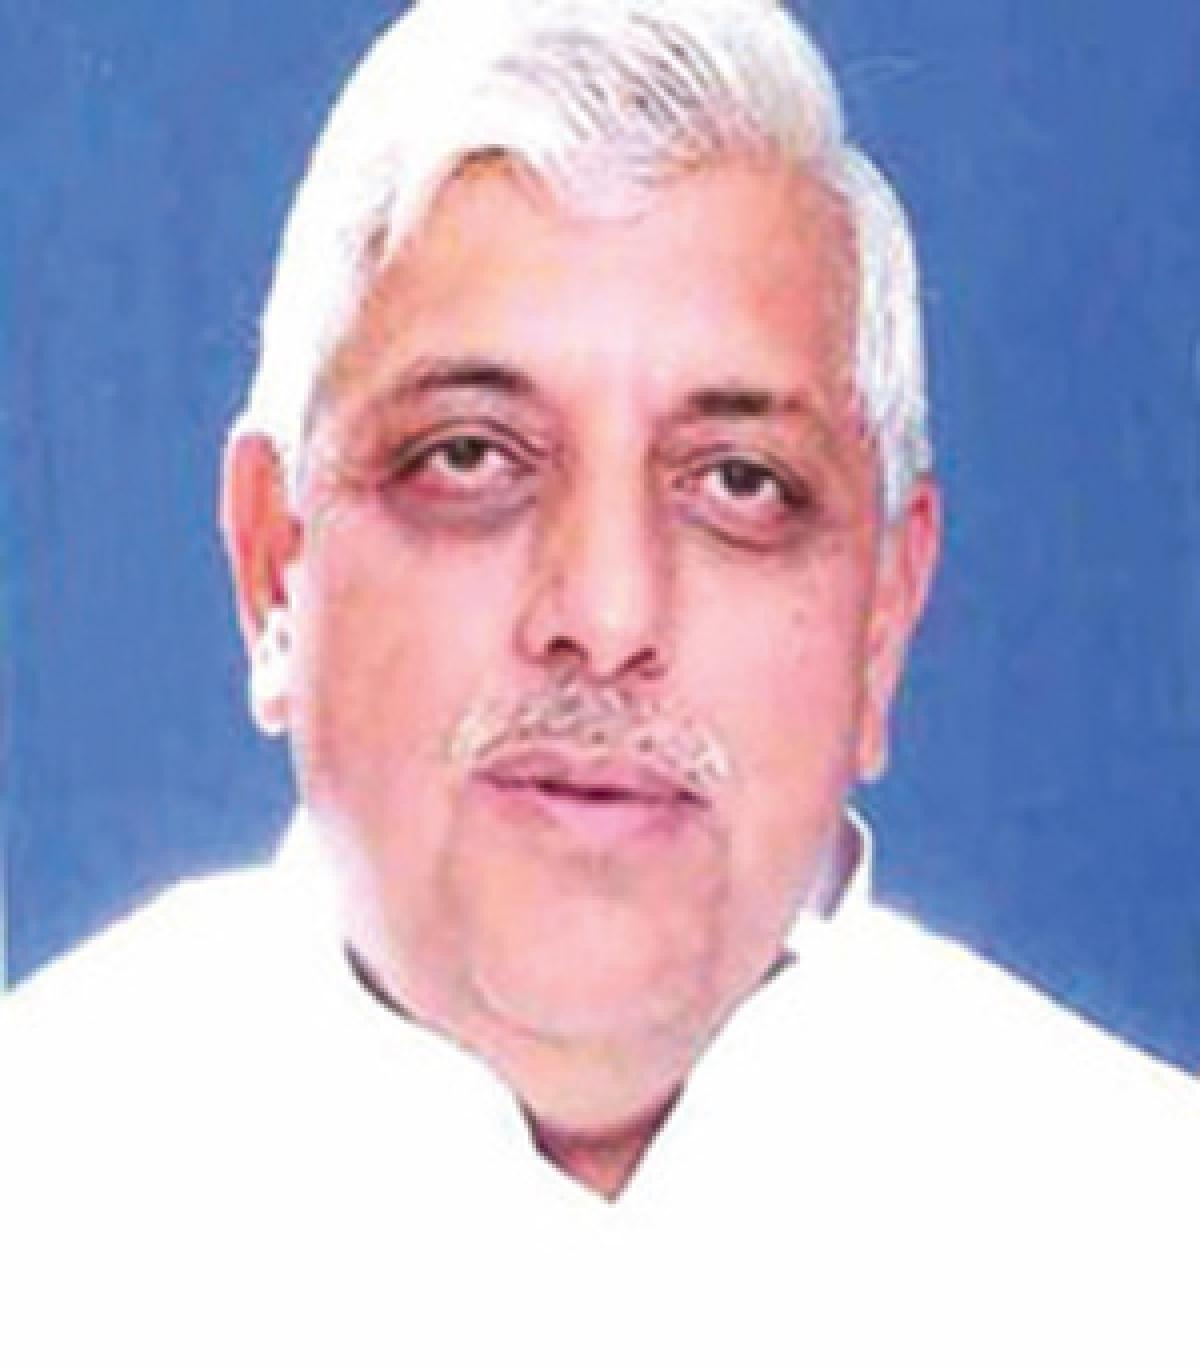 Bhopal: Senior BJP leader demands Sanjay Pathak's resignation